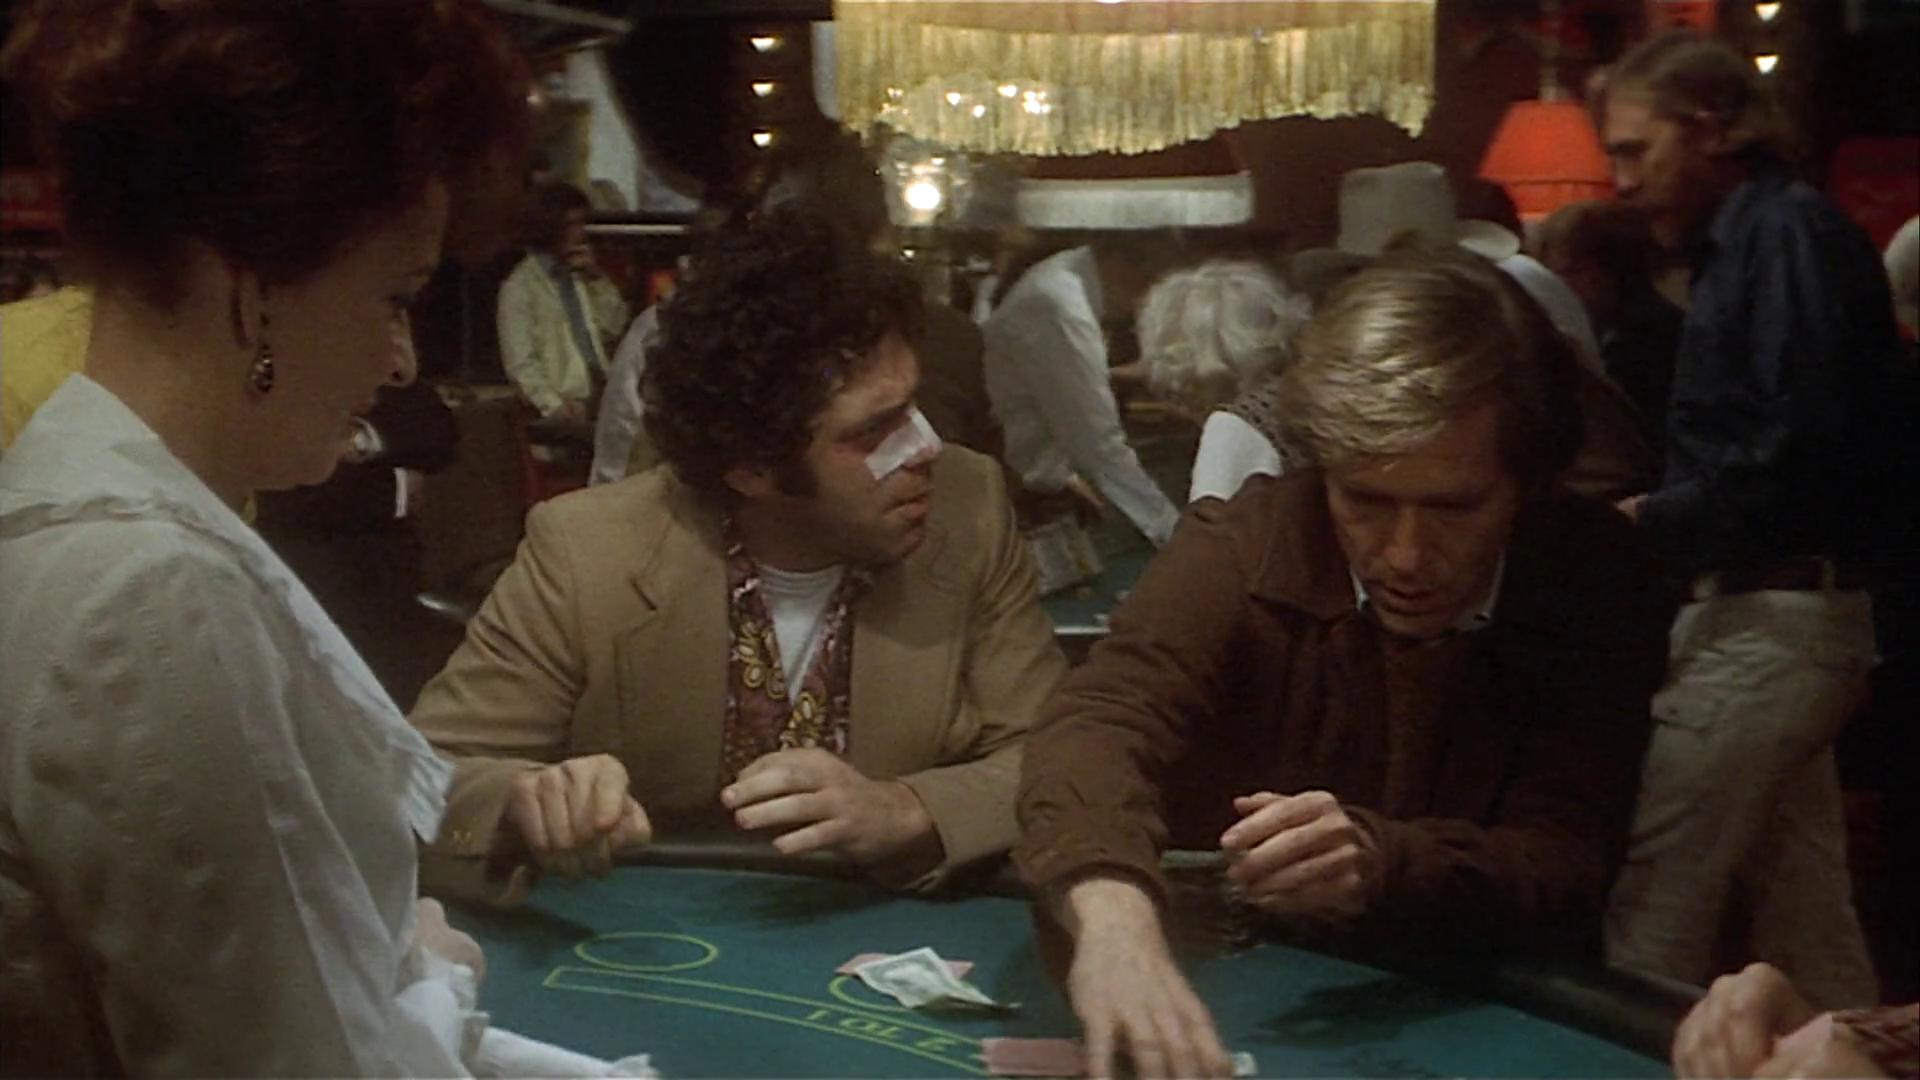 California Poker film